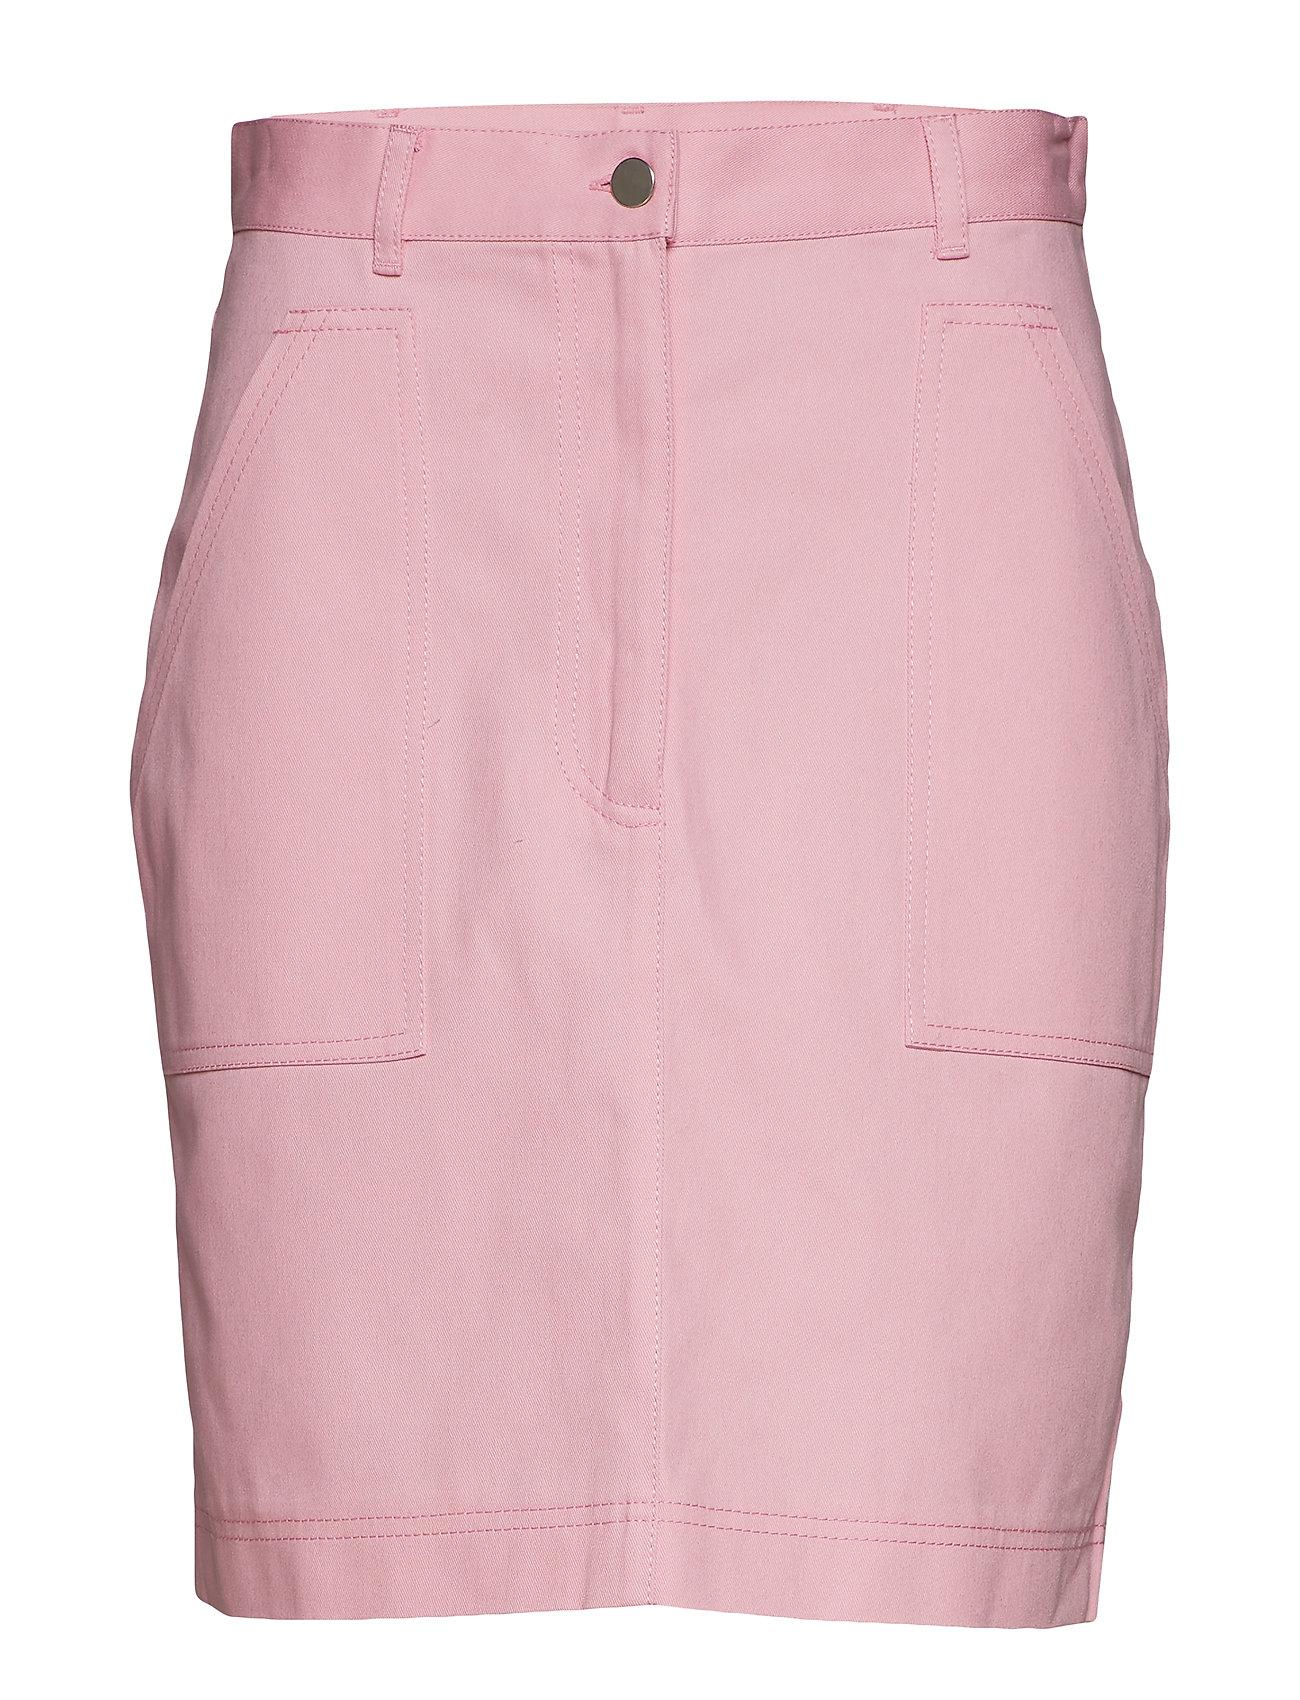 nué notes Zen Skirt - PINK LADY